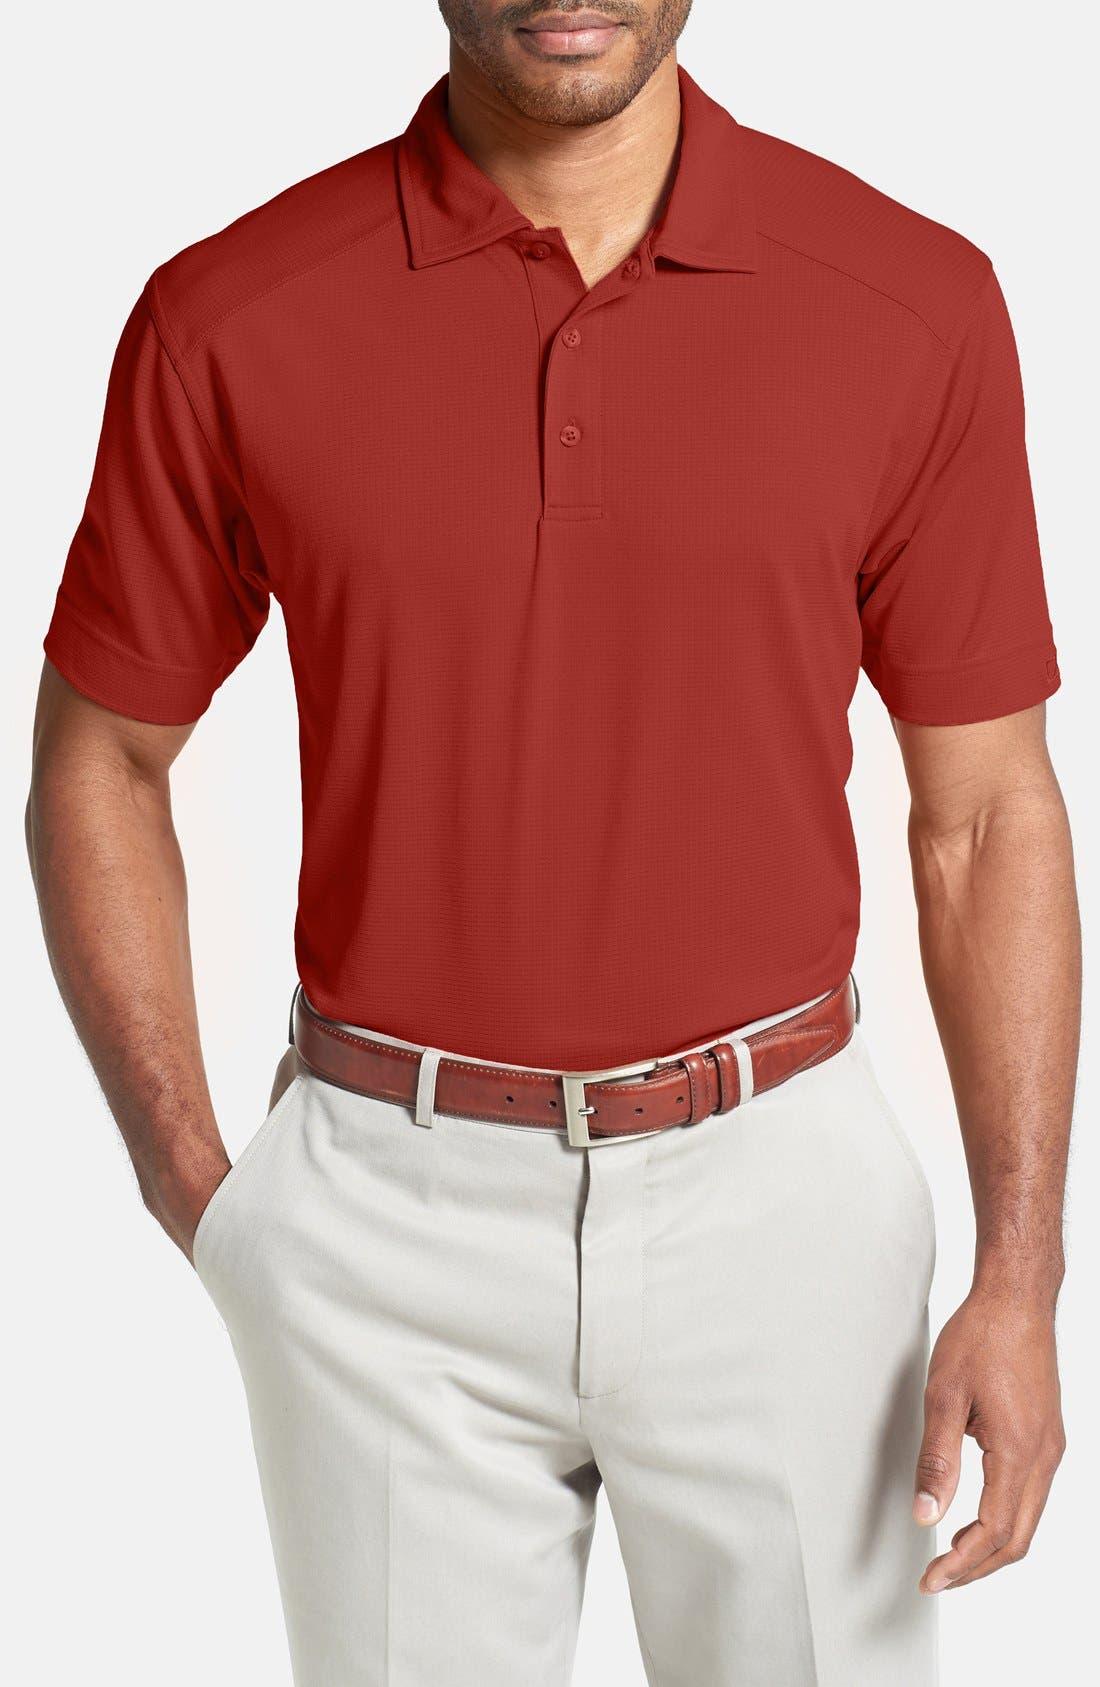 'Genre' DryTec Moisture Wicking Polo,                         Main,                         color, CARDINAL RED